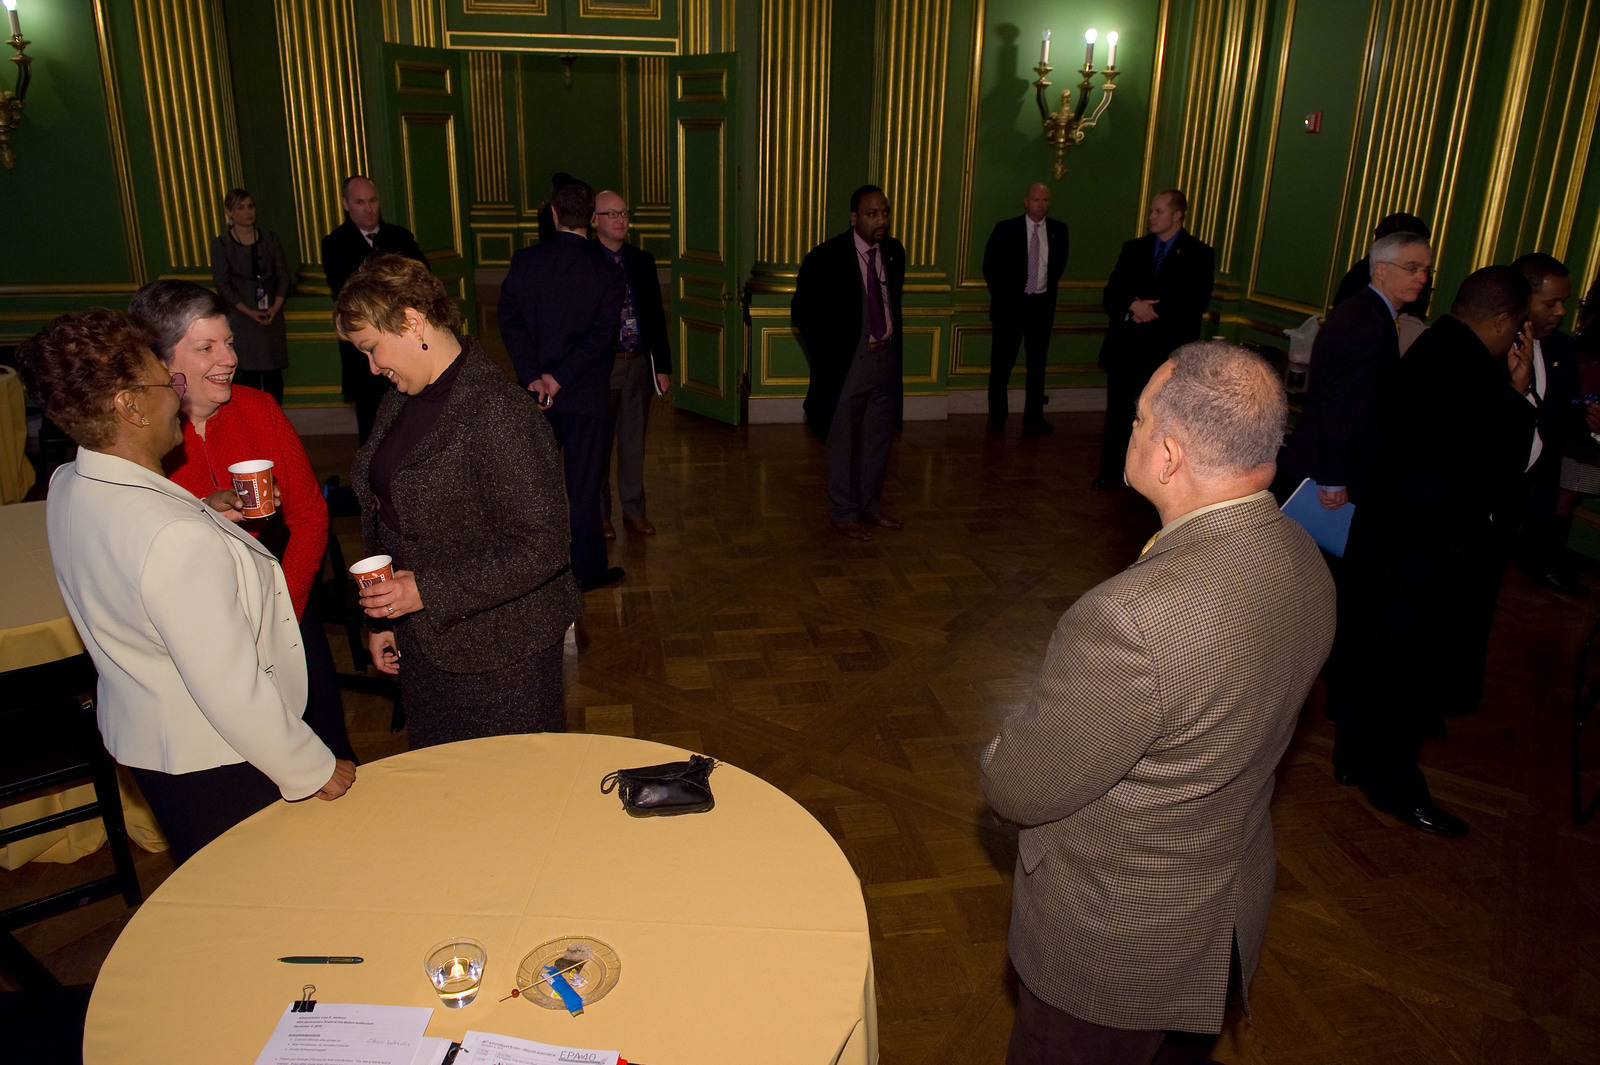 Office of the Administrator (Lisa P. Jackson) - EPA at 40: Speaker Series, Open House, Mellon Auditorium [412-APD-630-2010-12-02_c_At40Melon_082.jpg]